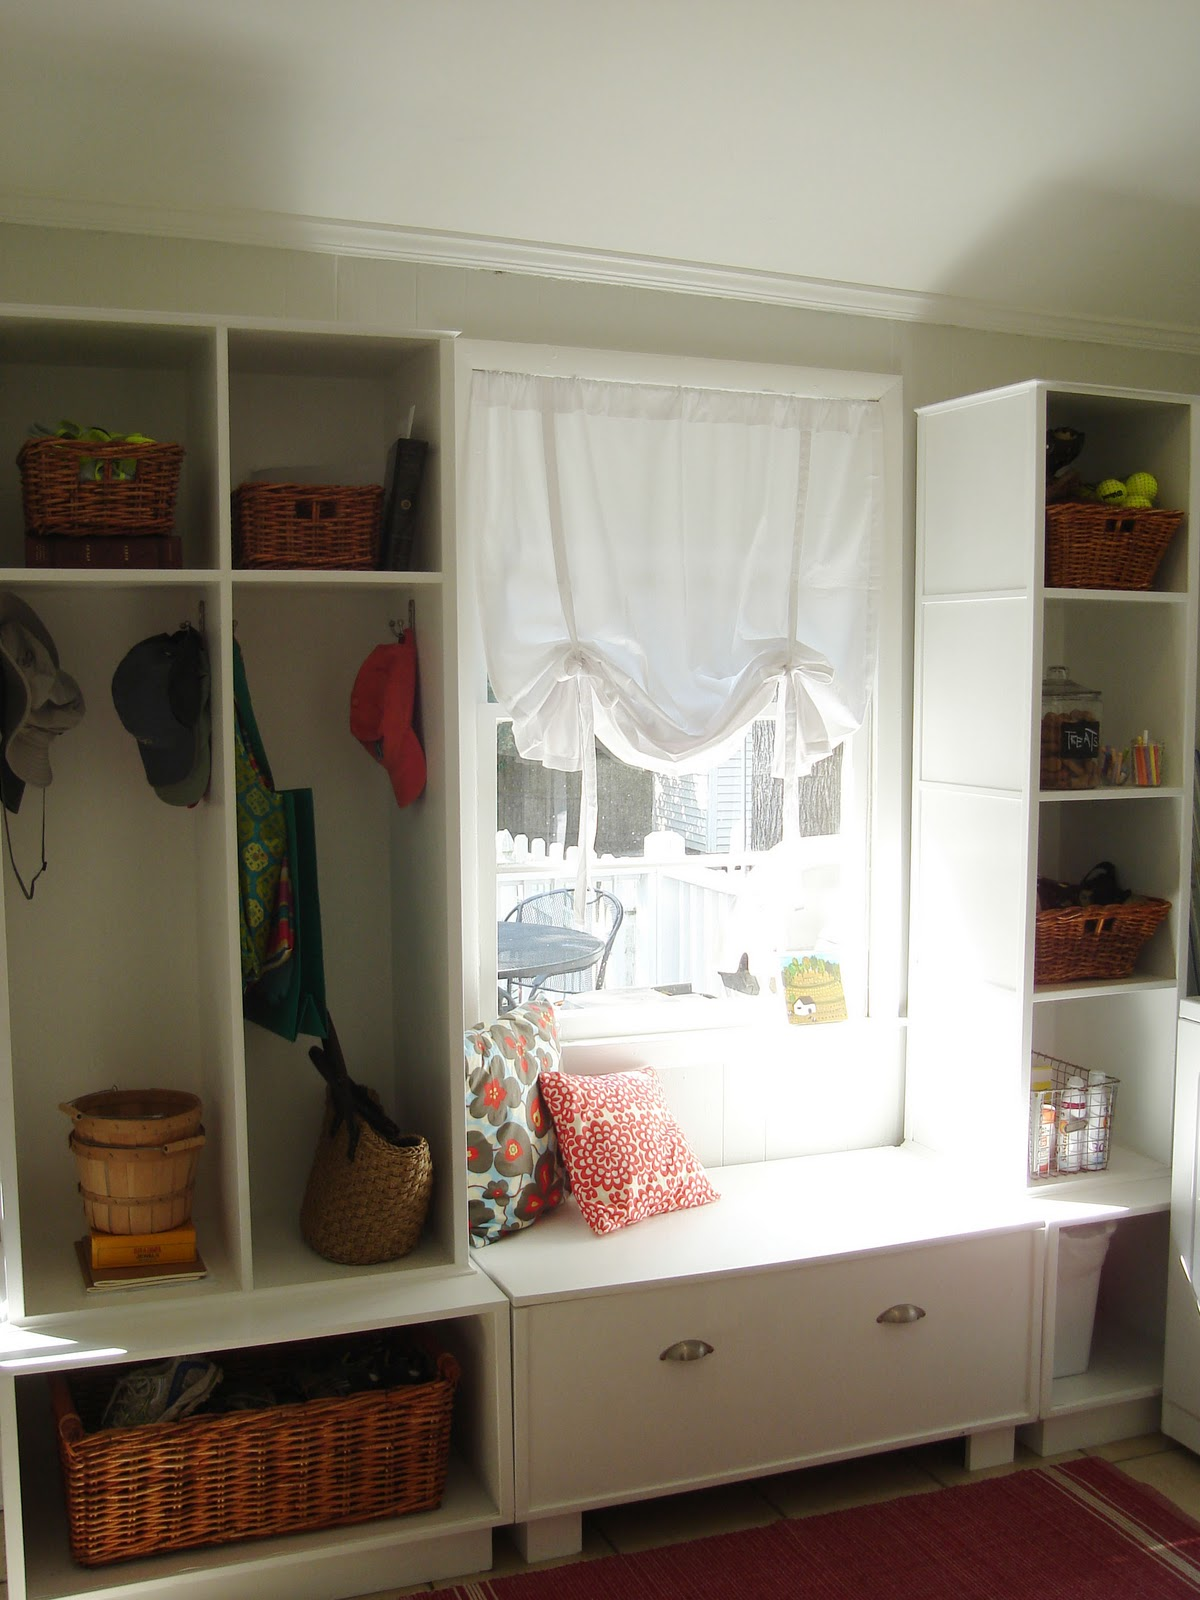 http://i2.wp.com/2.bp.blogspot.com/_V7ObogxMFrM/TLdg6KlTkrI/AAAAAAAAAaU/7kMD-KGOF6w/s1600/laundryroom2.jpg?resize=399%2C533